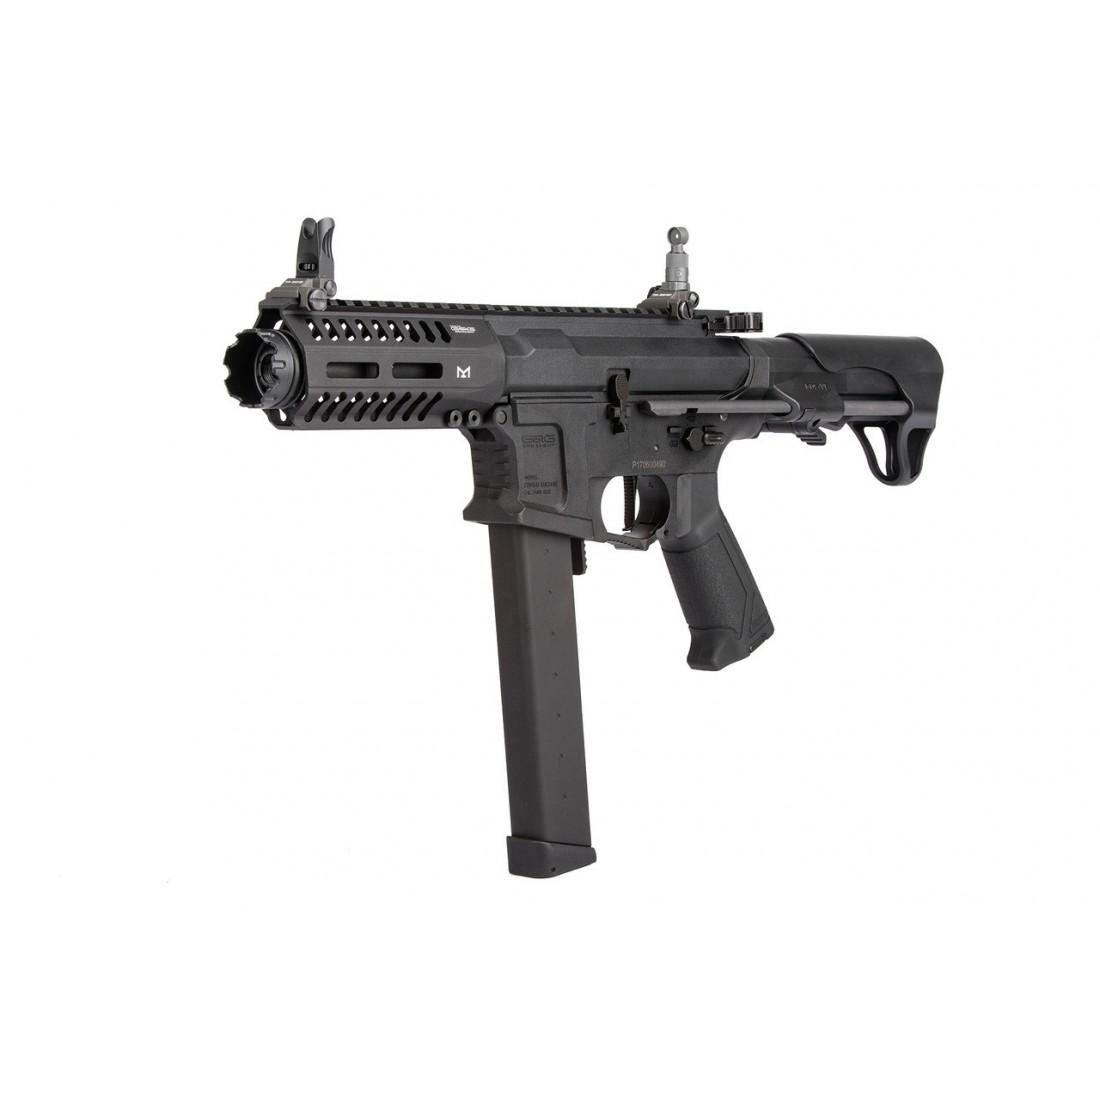 AEG ARP9 bk (EGC-ARP-9MM-BNB-NCM) [G&G]